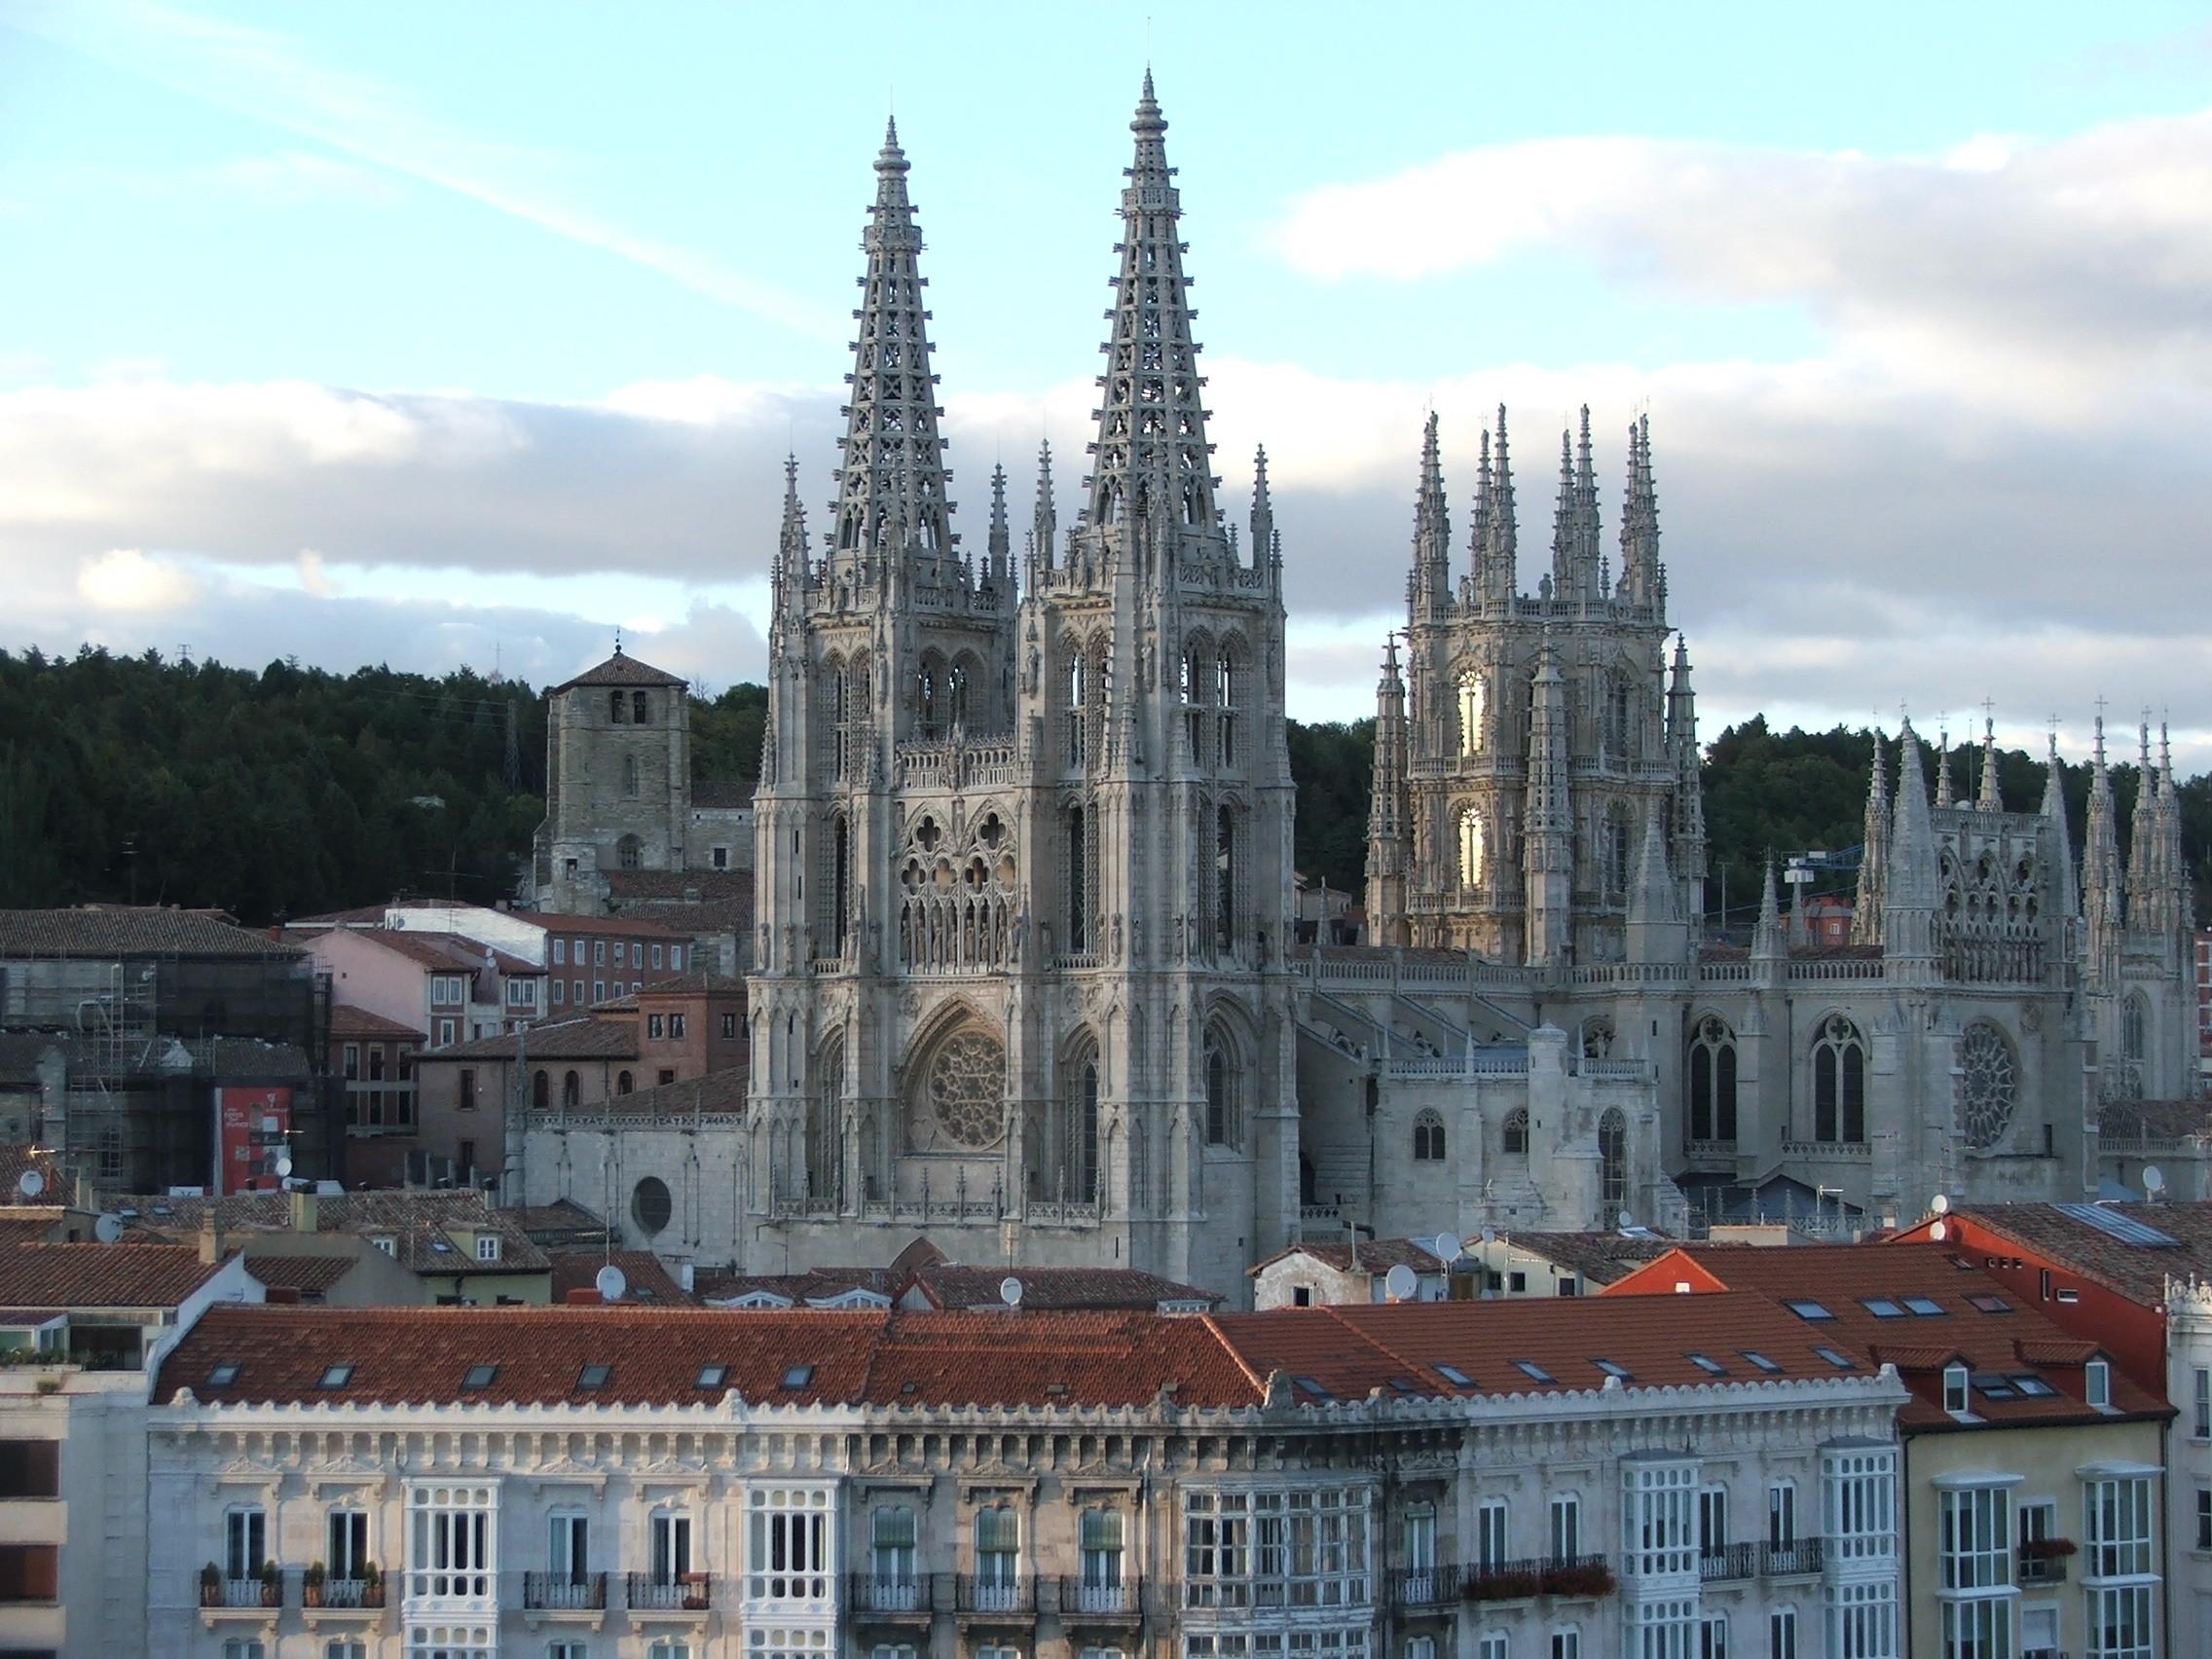 https://i2.wp.com/upload.wikimedia.org/wikipedia/commons/1/19/Catedral_de_Burgos_II.jpg